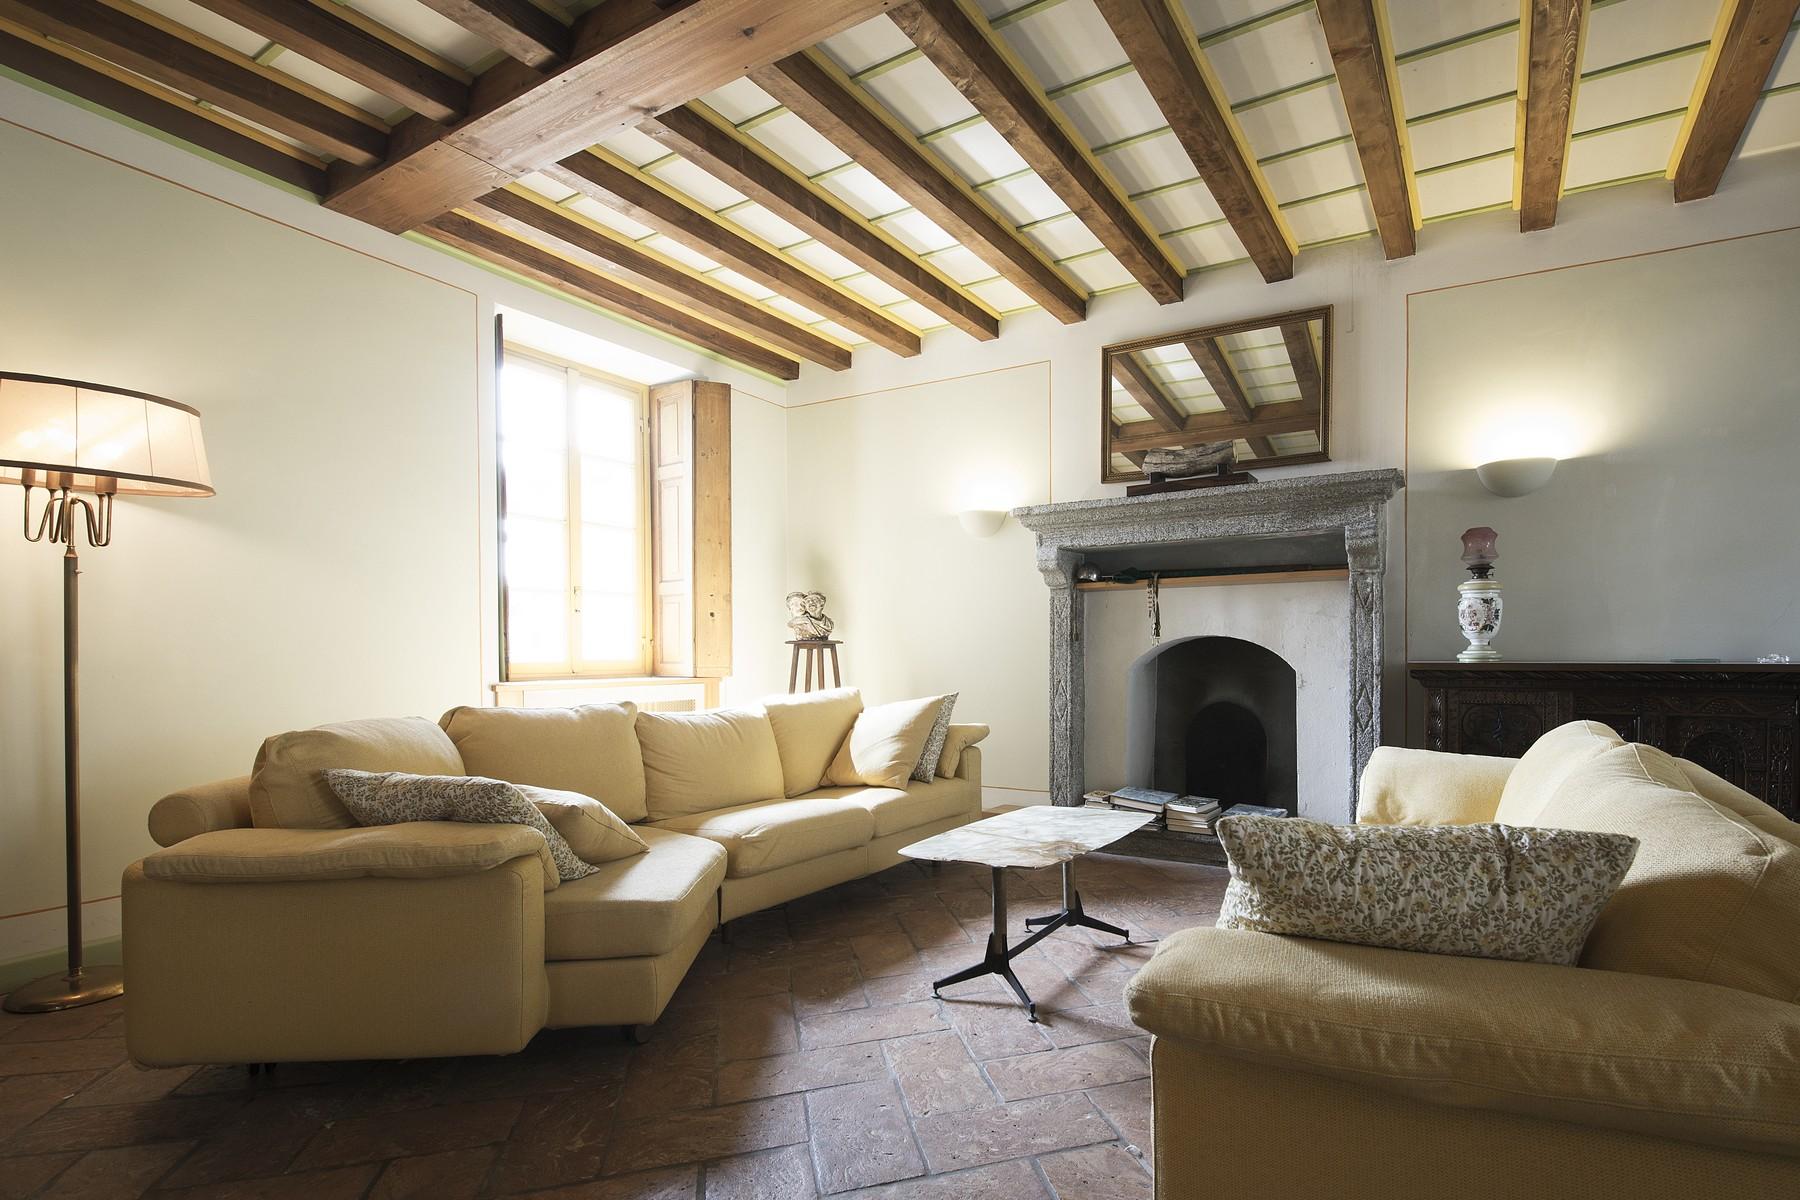 Additional photo for property listing at Ancient Castle of Palanzo Via Monte Palanzone Faggeto Lario, Como 22020 Italia